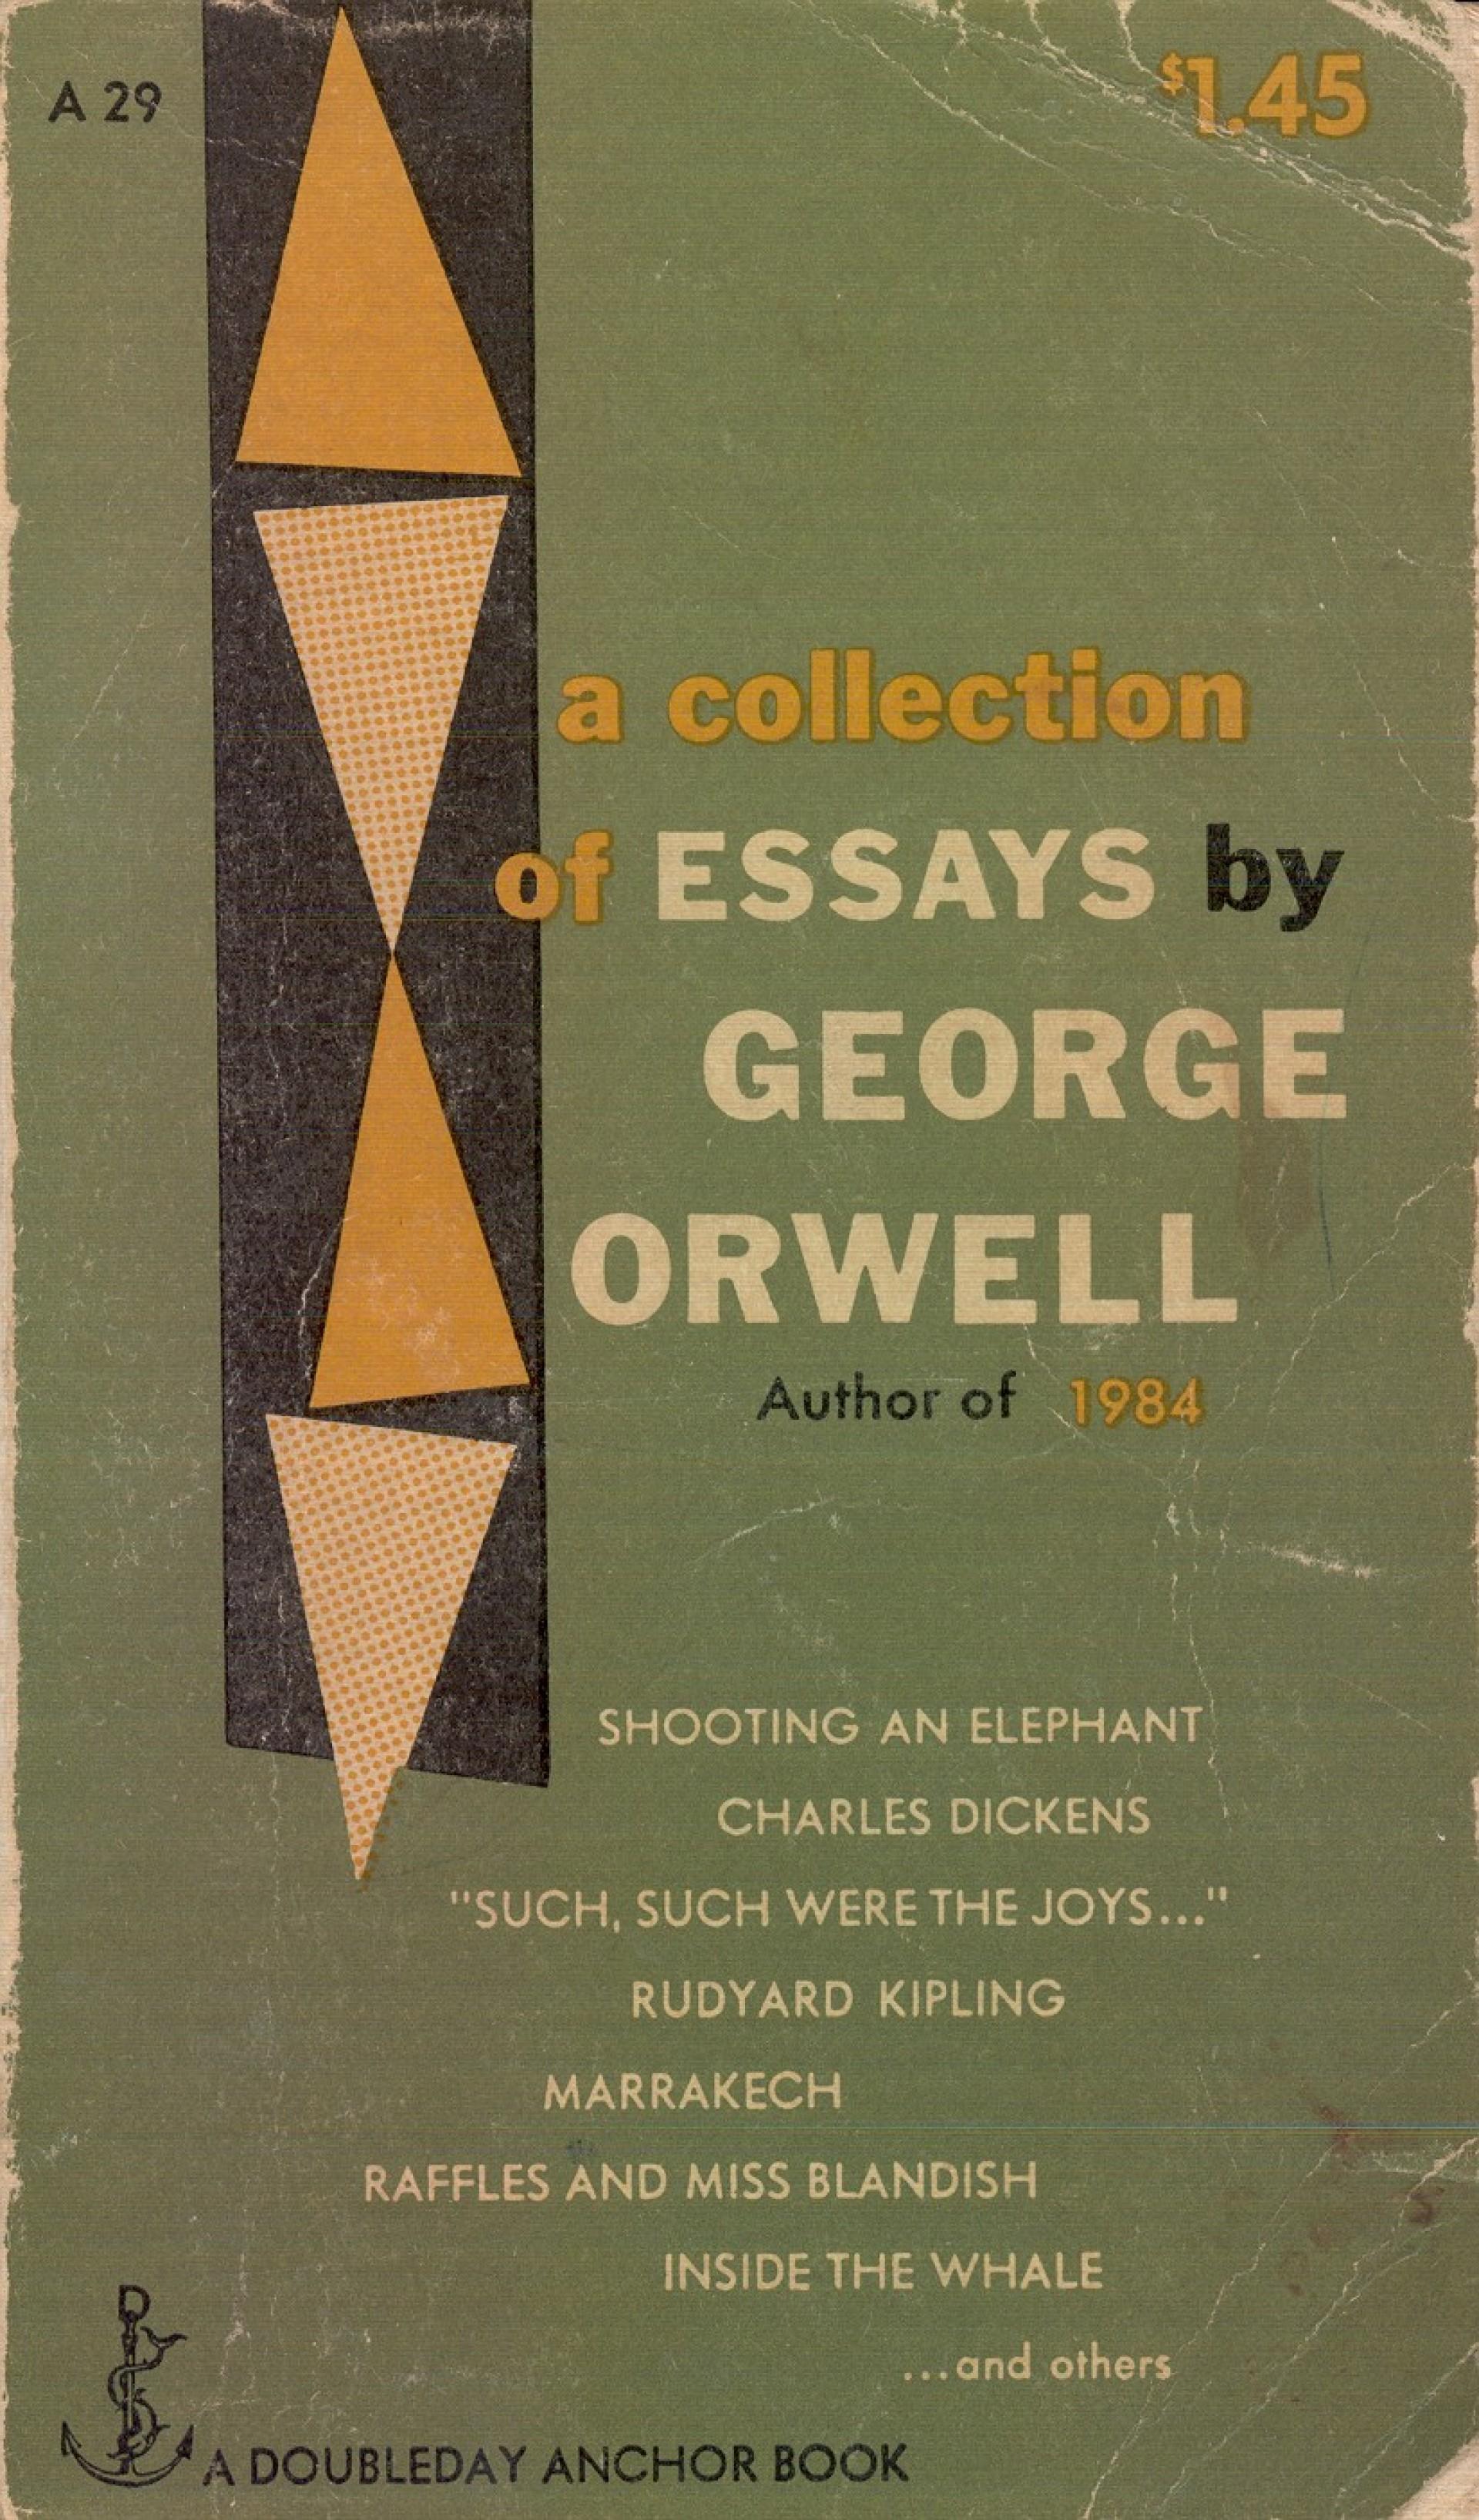 019 Essay Example Orwell George Frightening Essays Everyman's Library Summary Bookshop Memories 1920